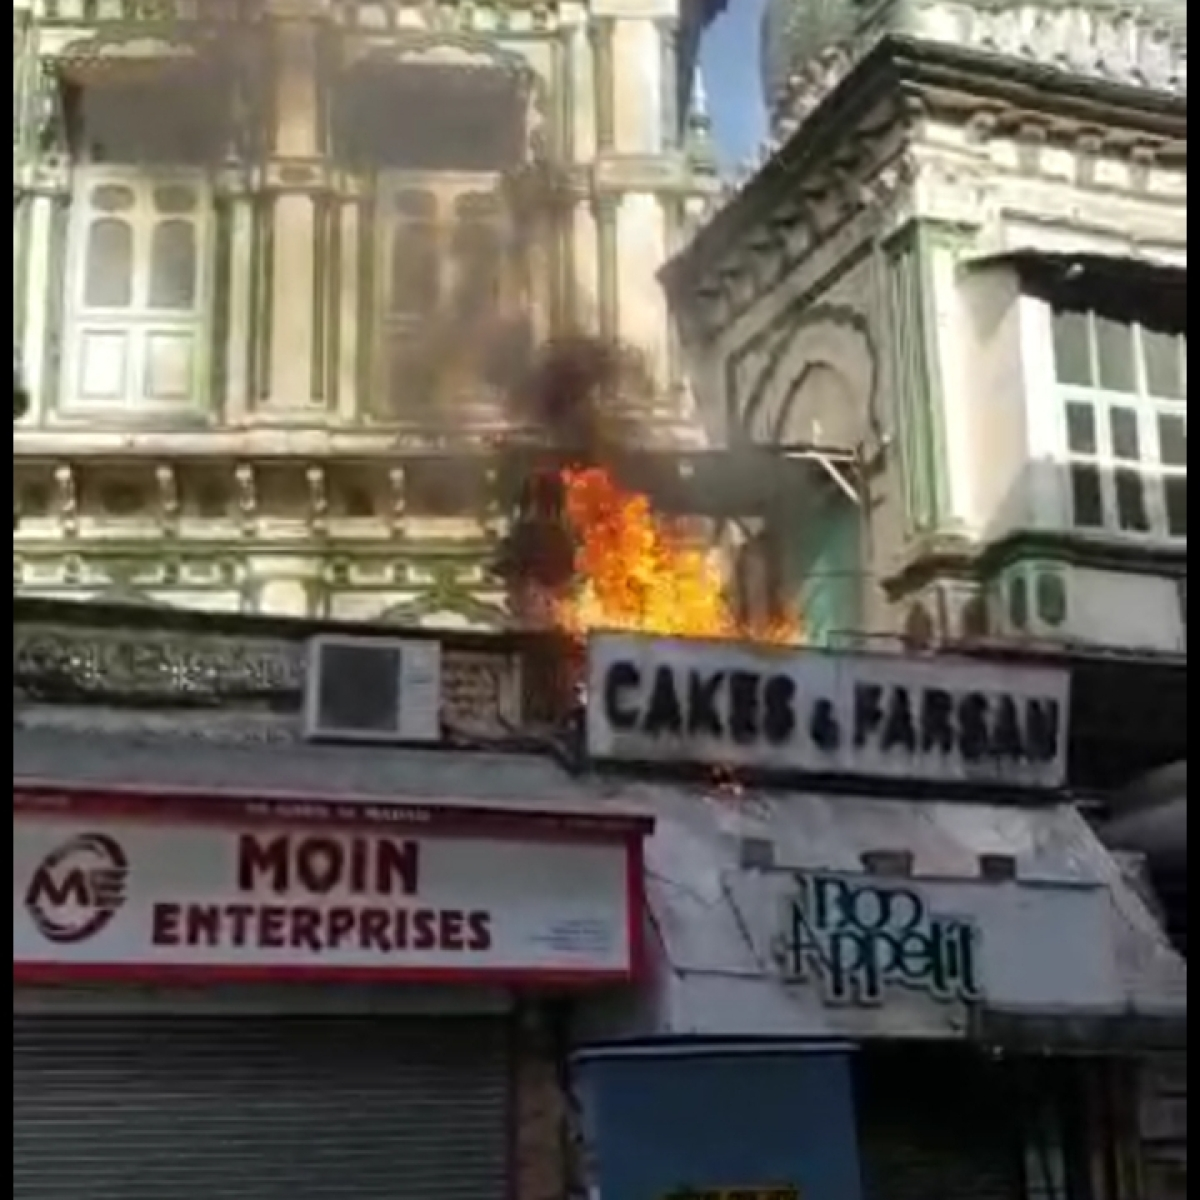 Watch: Fire breaks out at Mumbai's Minara Masjid in Bhendi Bazar